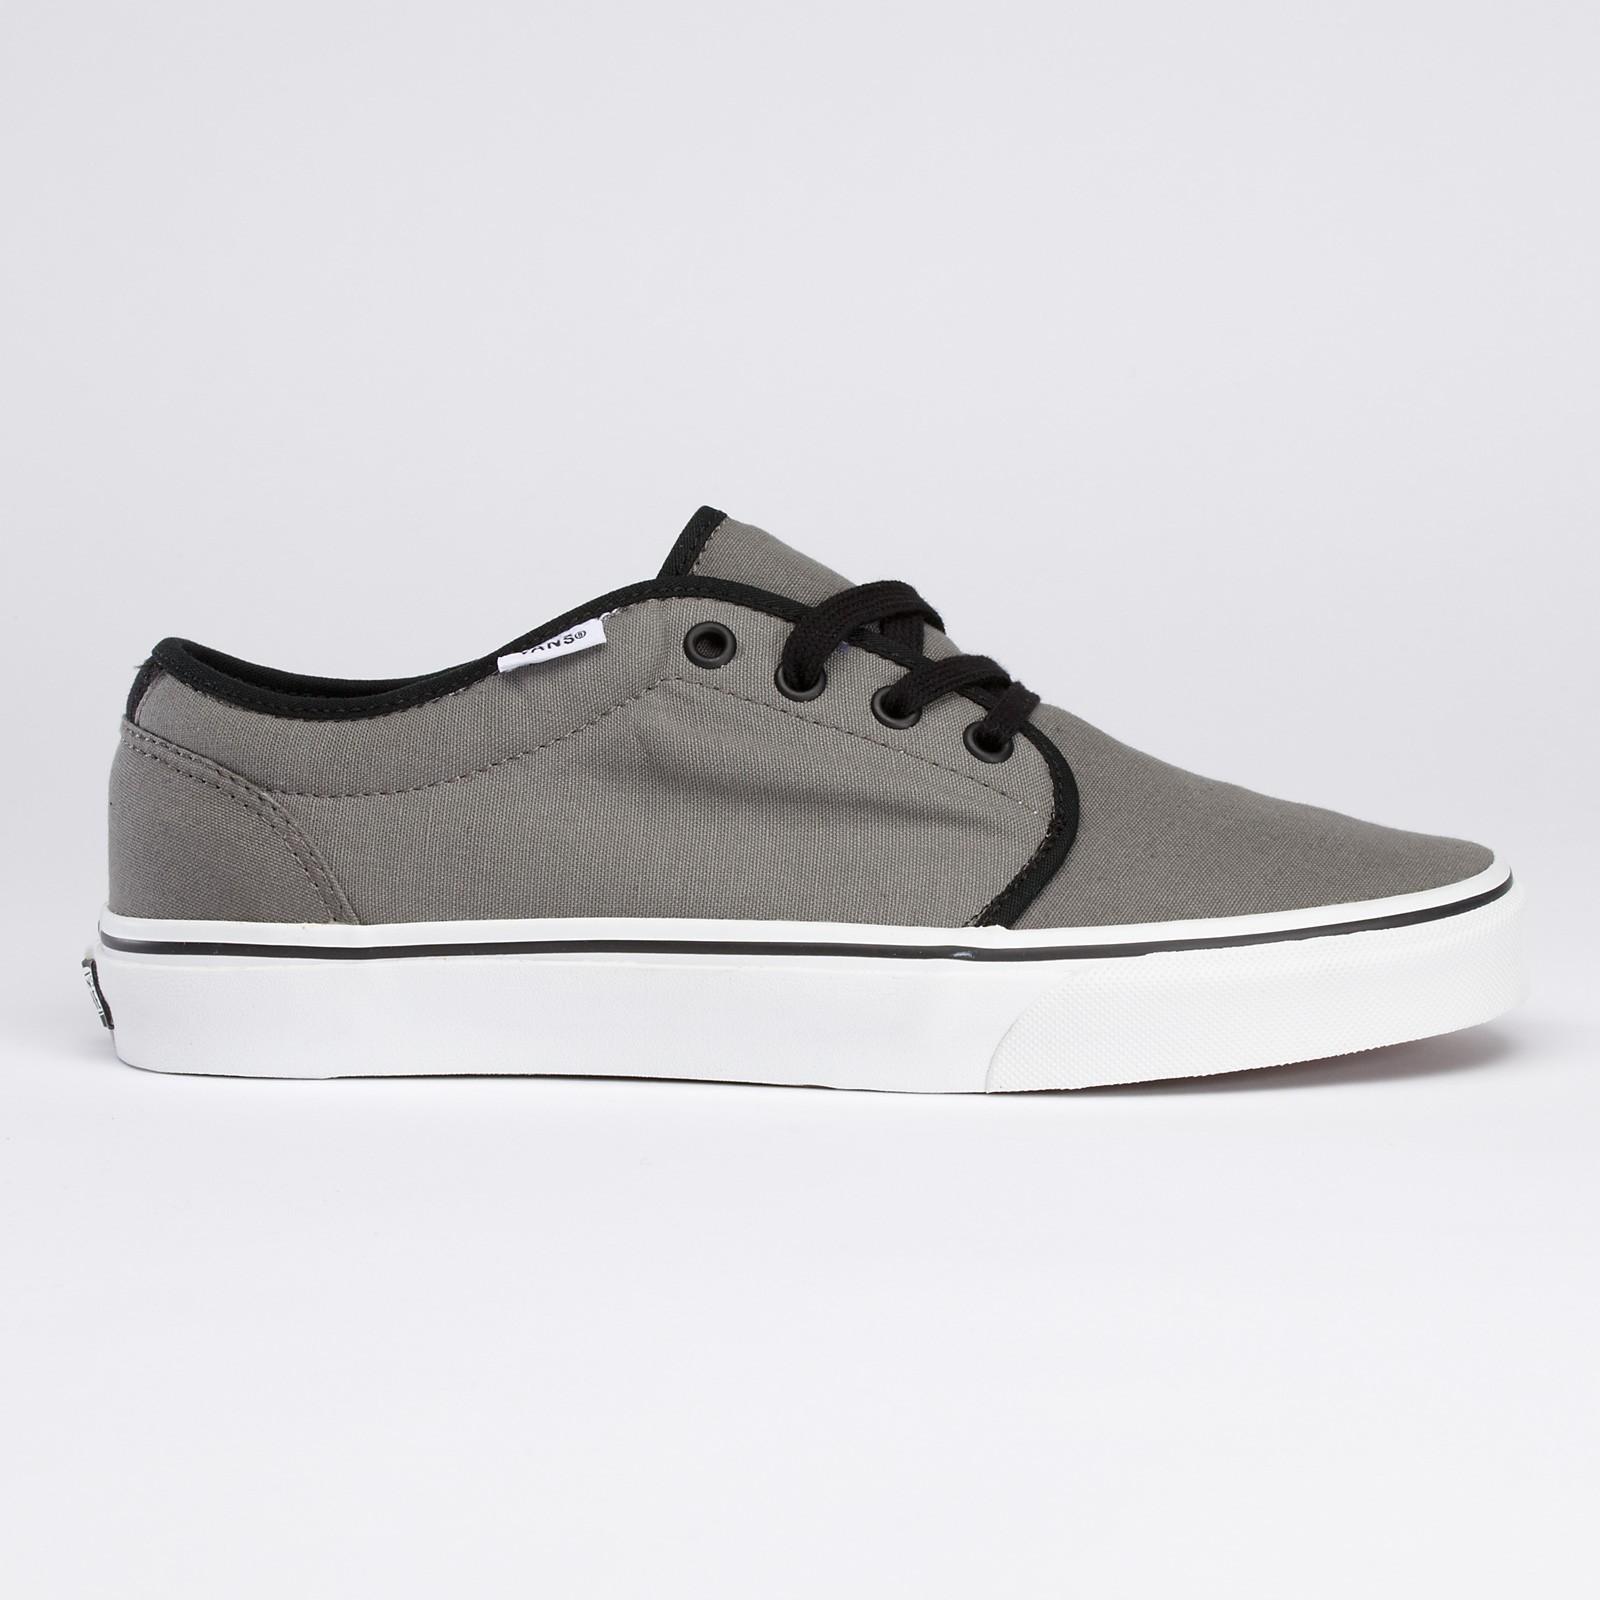 Vans vulcanized grey footshop jpg 1600x1600 Vans 106 vulcanized grey 6688f6e83